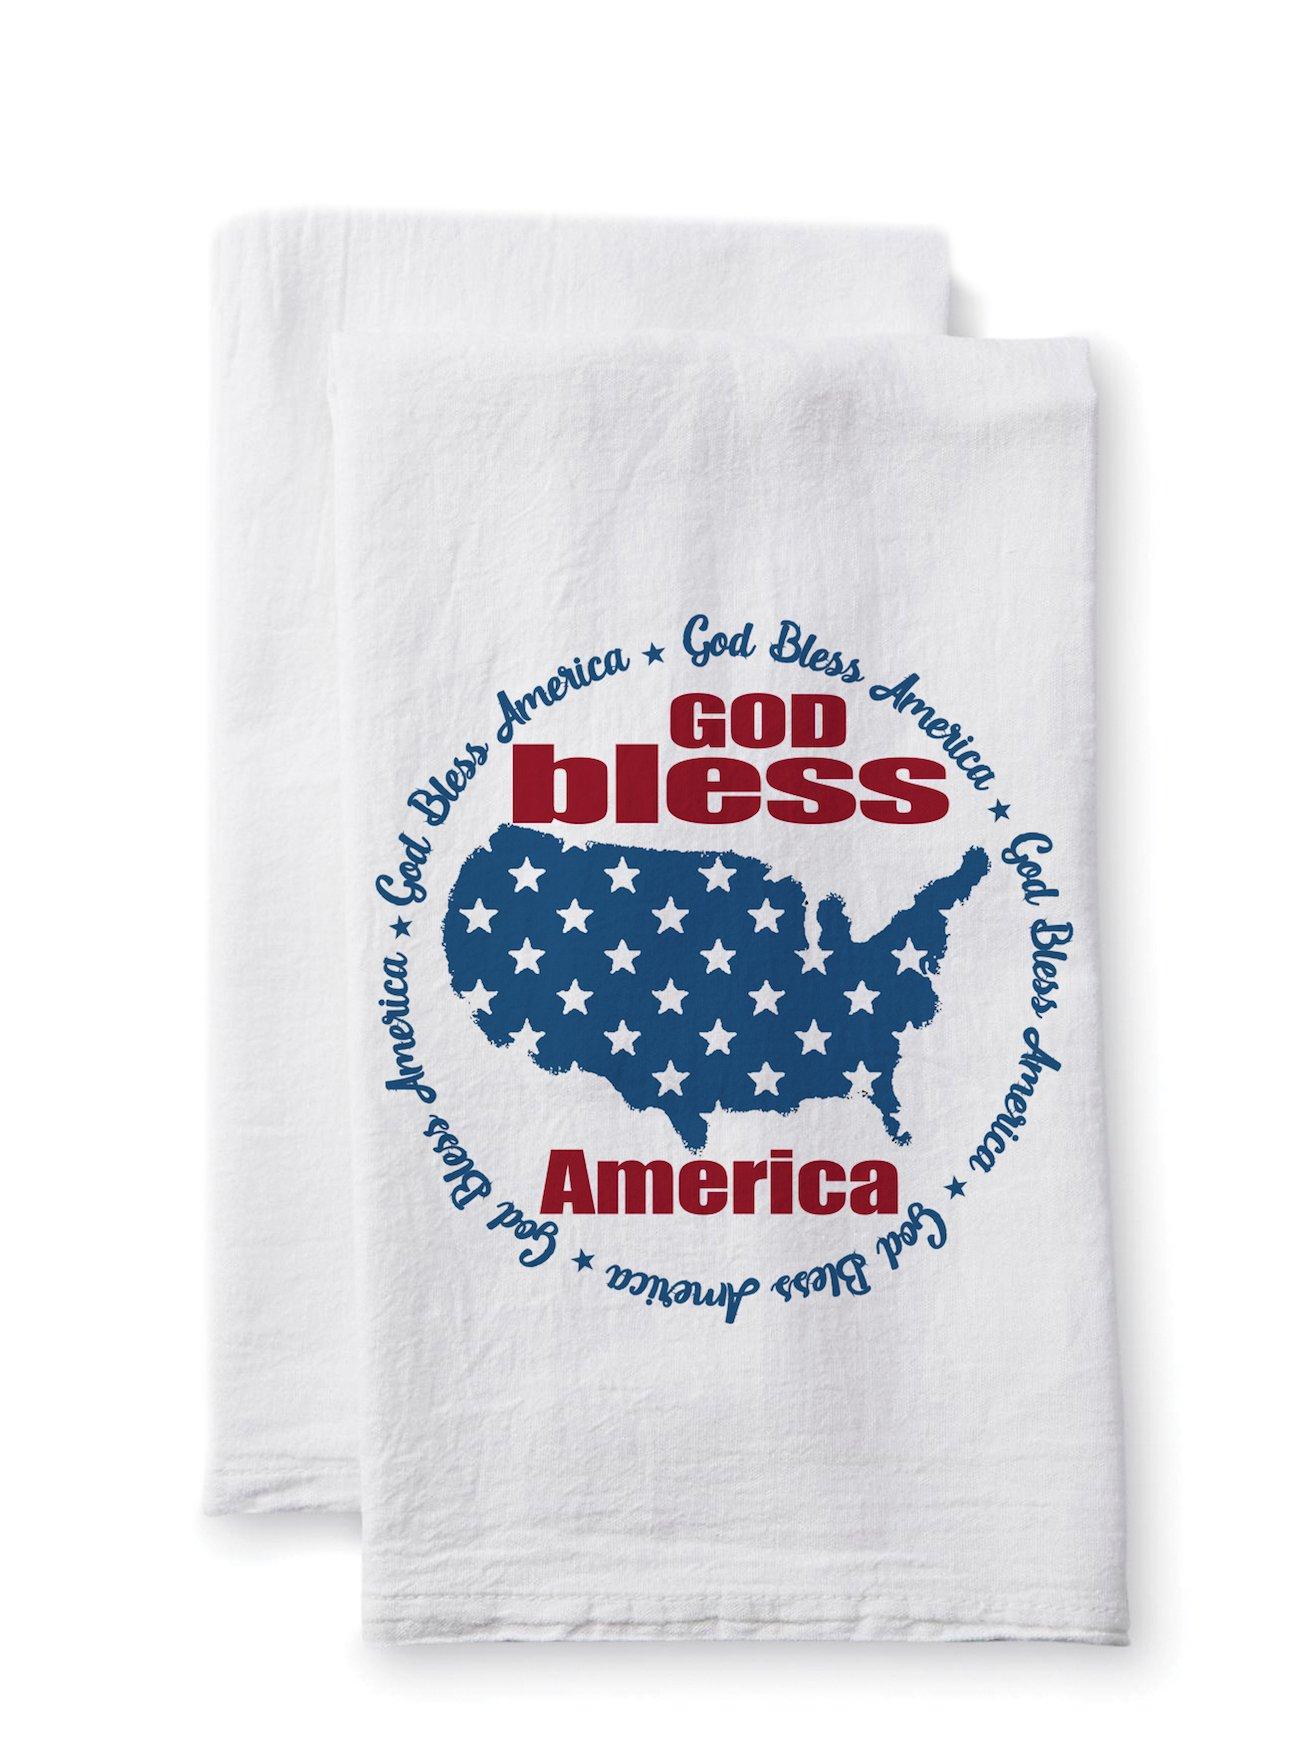 Sullivans Uplifting Linens Towels God Bless America, 28 x 28 Inches, White (ULTL120) 2-Pack